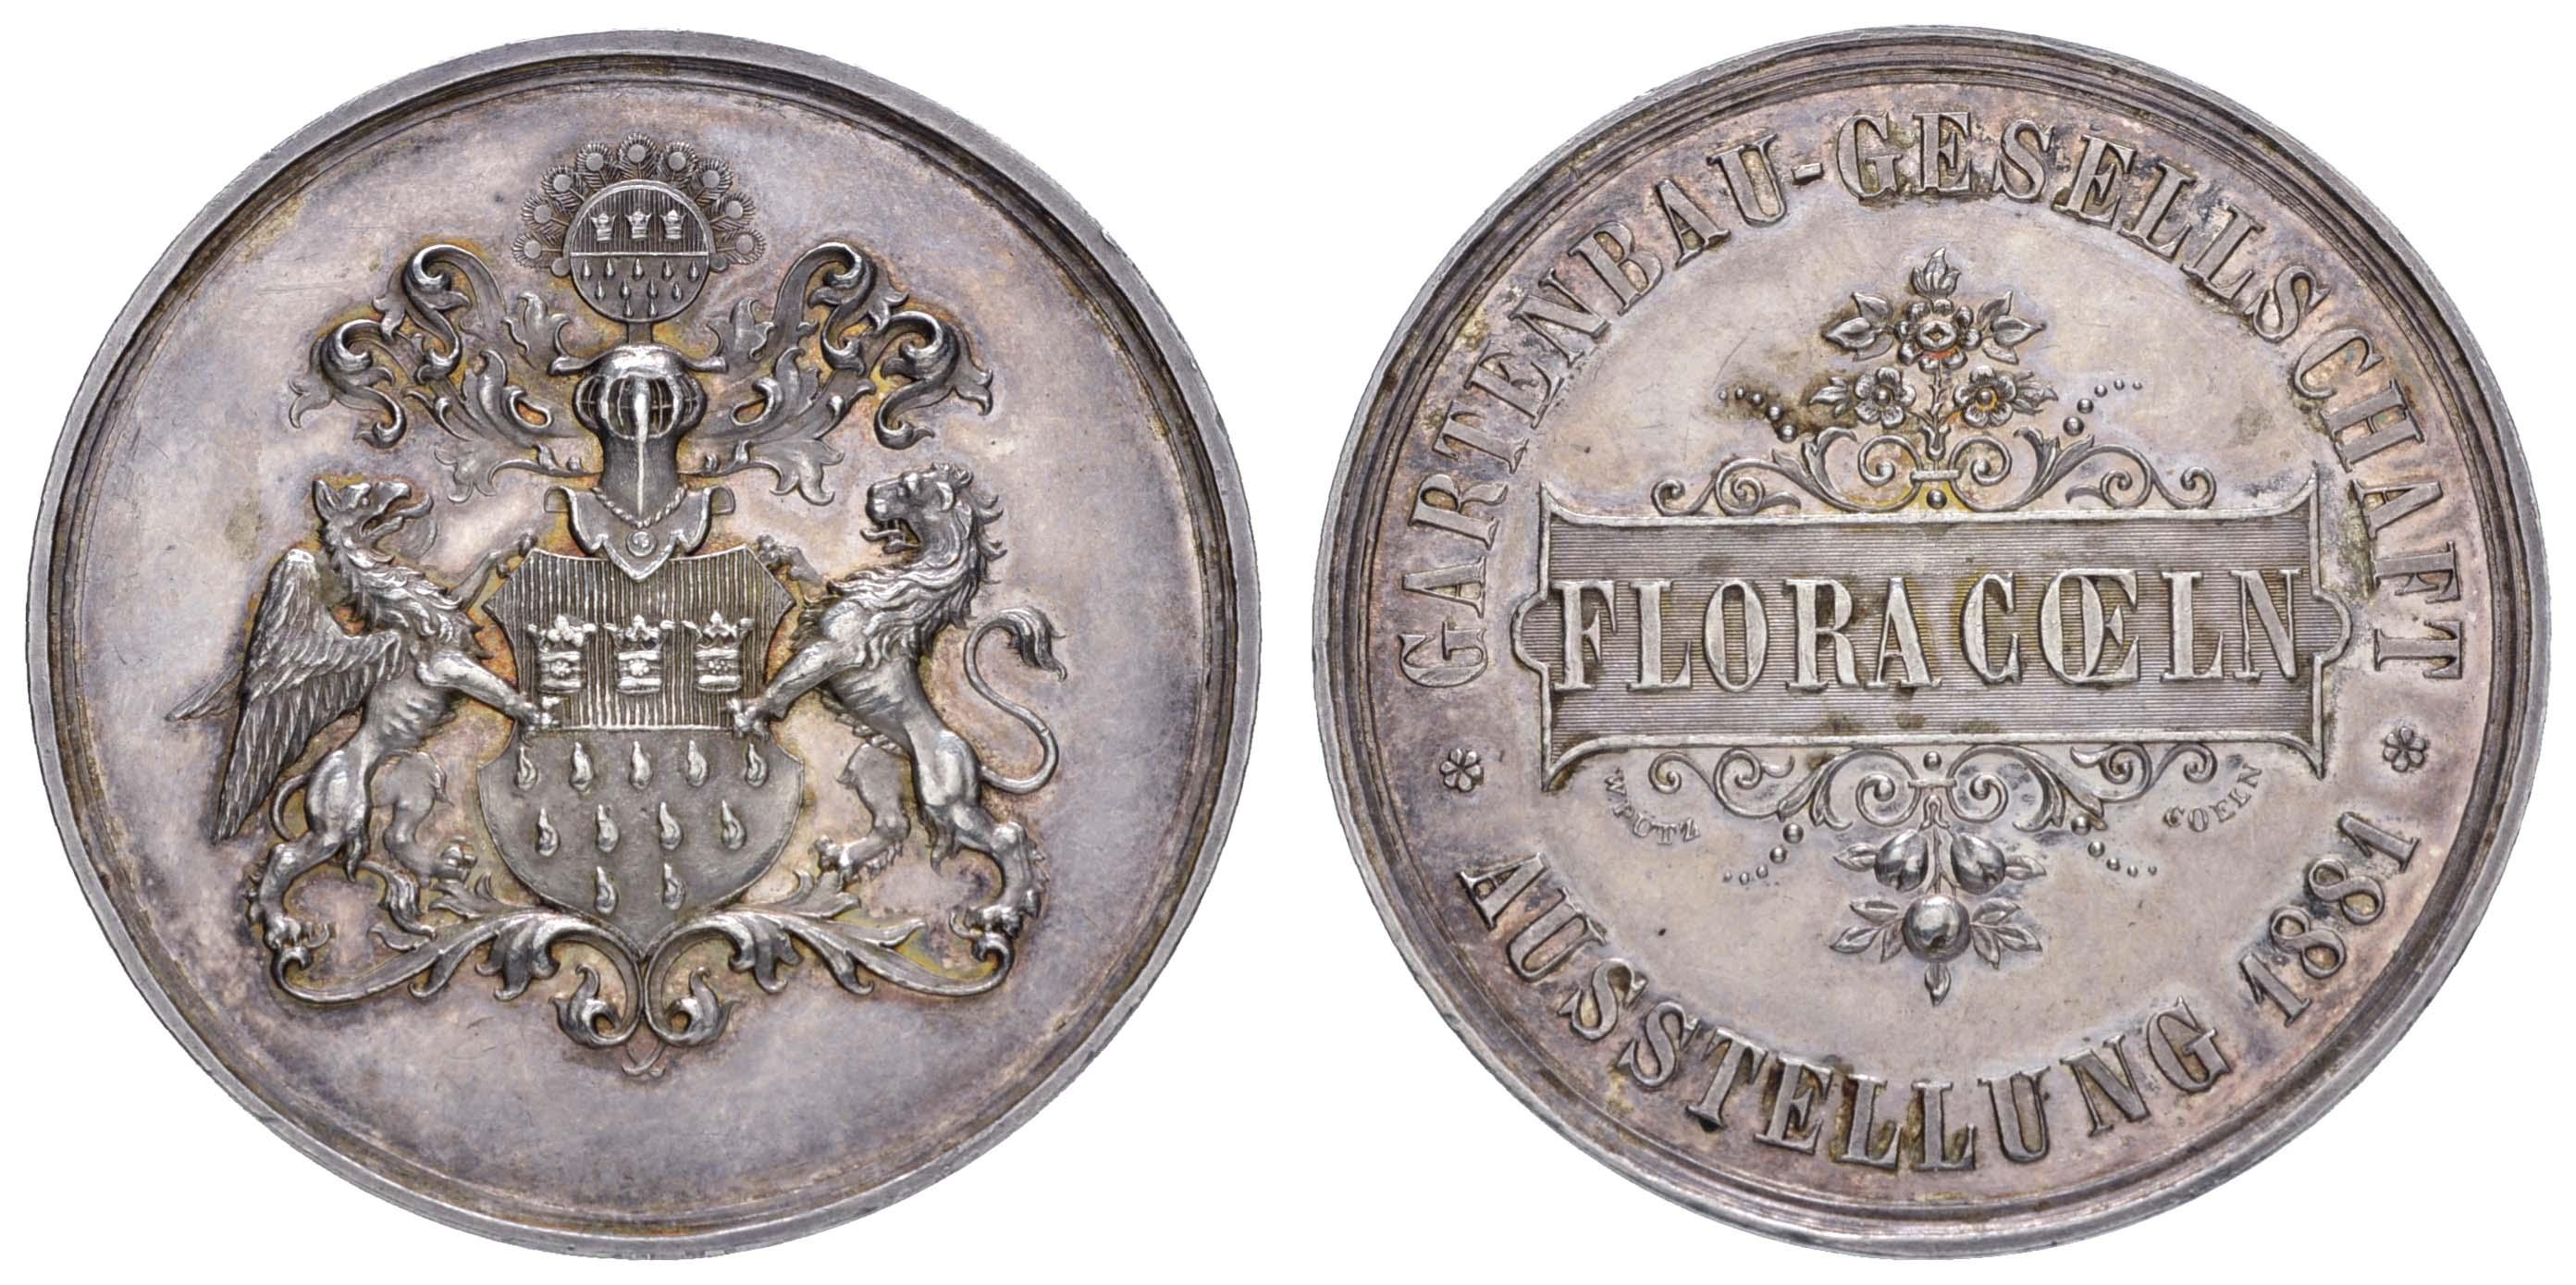 Lot 2122 - medaillen Sonstige Medaillen - Städtemedaillen -  Auktionshaus Ulrich Felzmann GmbH & Co. KG Auction 161 from March 6-10, 2018